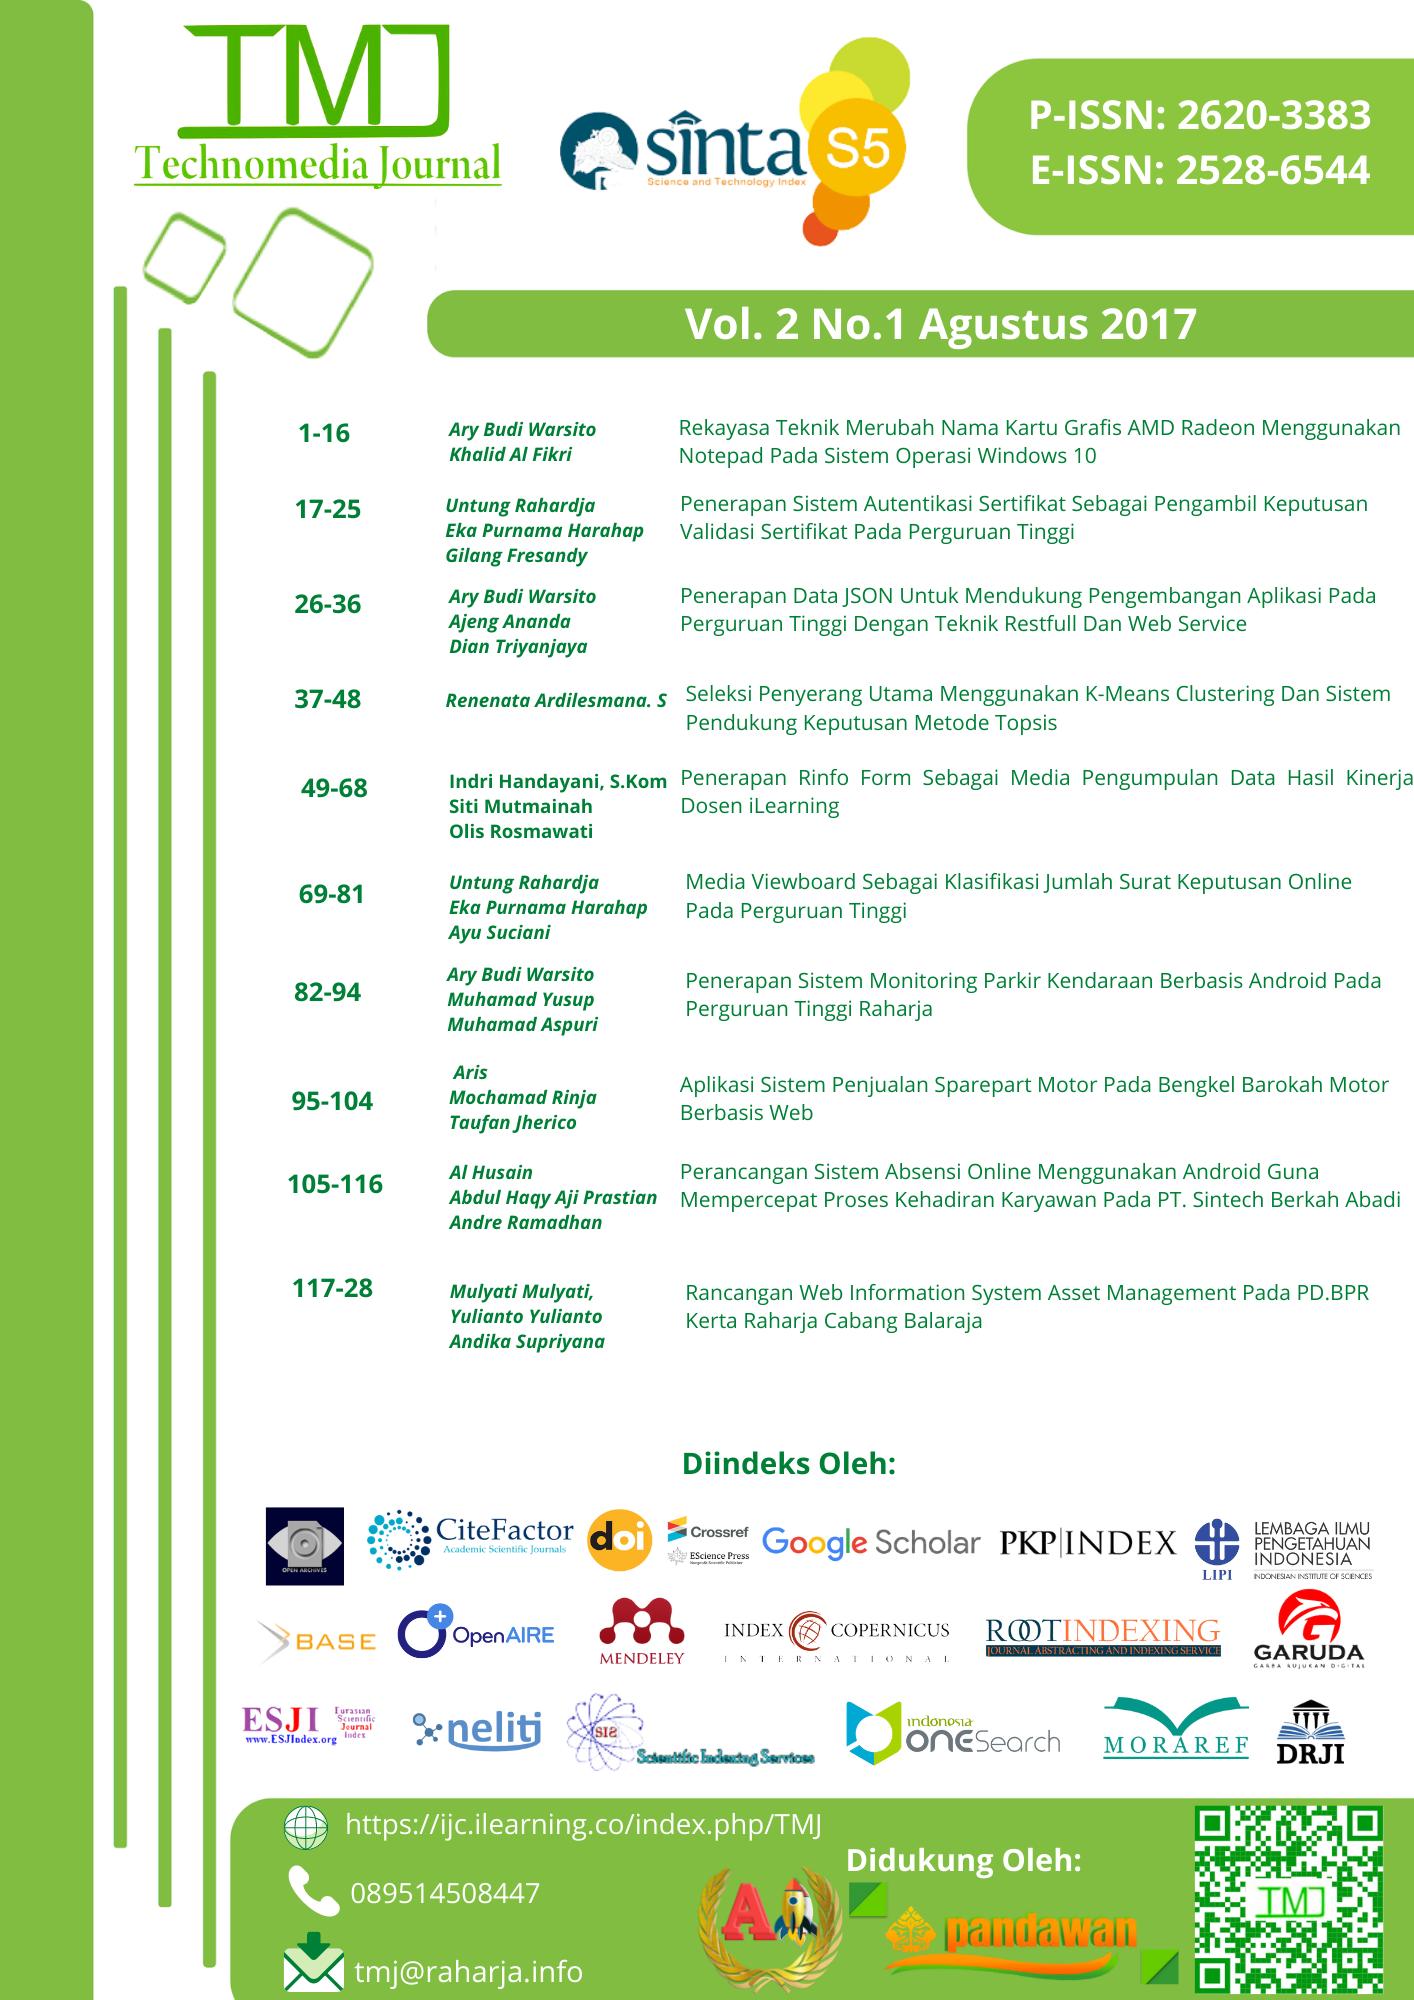 Lihat Vol 2 No 1 Agustus (2017): Technomedia Journal